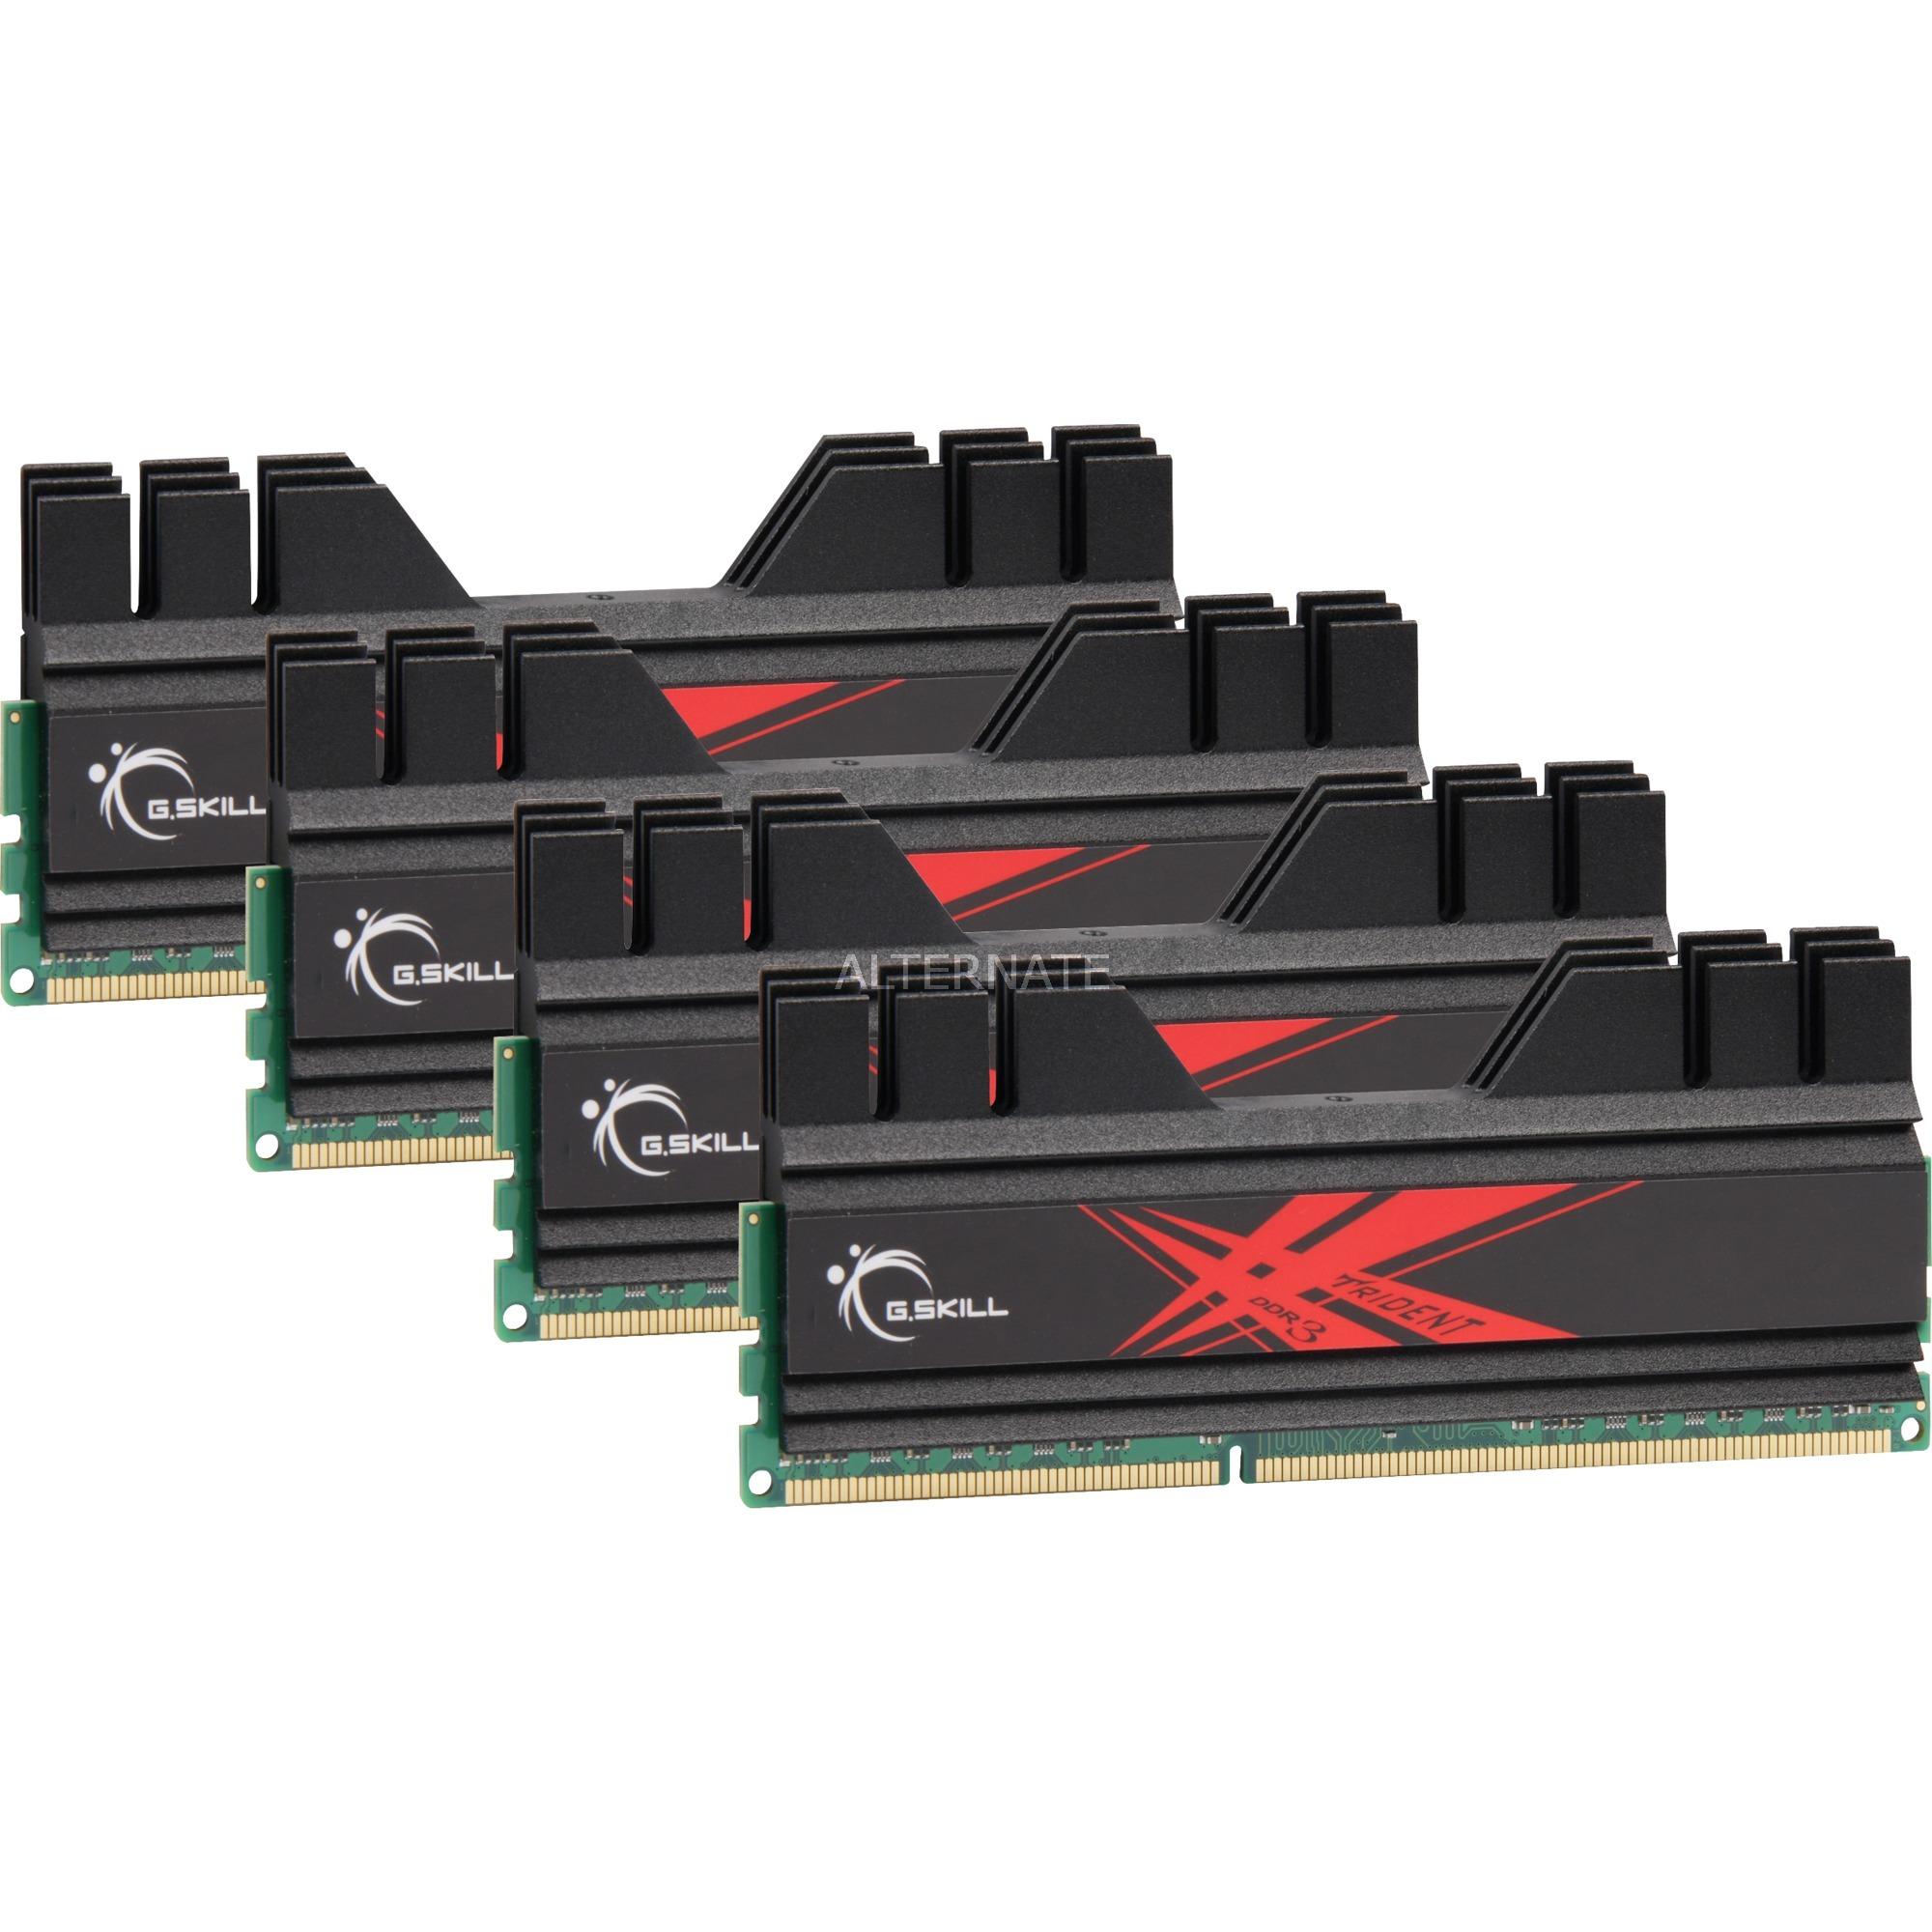 16GB DDD3-2400 16GB DDR3 2400MHz módulo de memoria, Memoria RAM